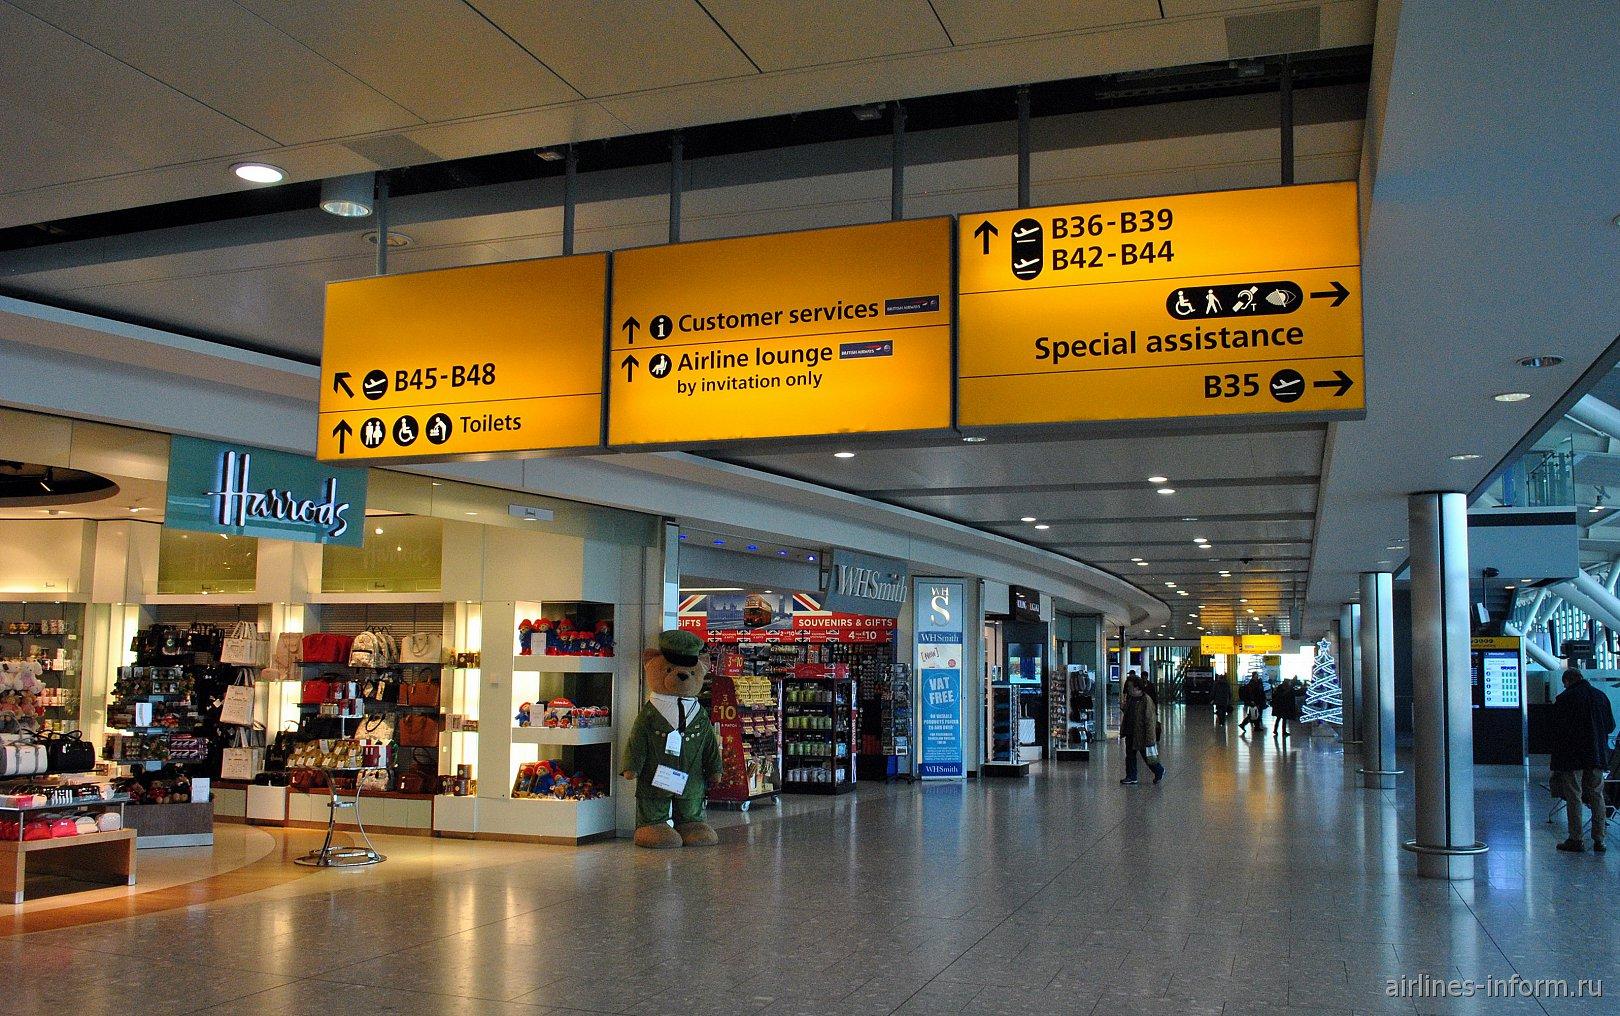 Магазины Duty-Free в терминале Т5B аэропорта Лондон Хитроу